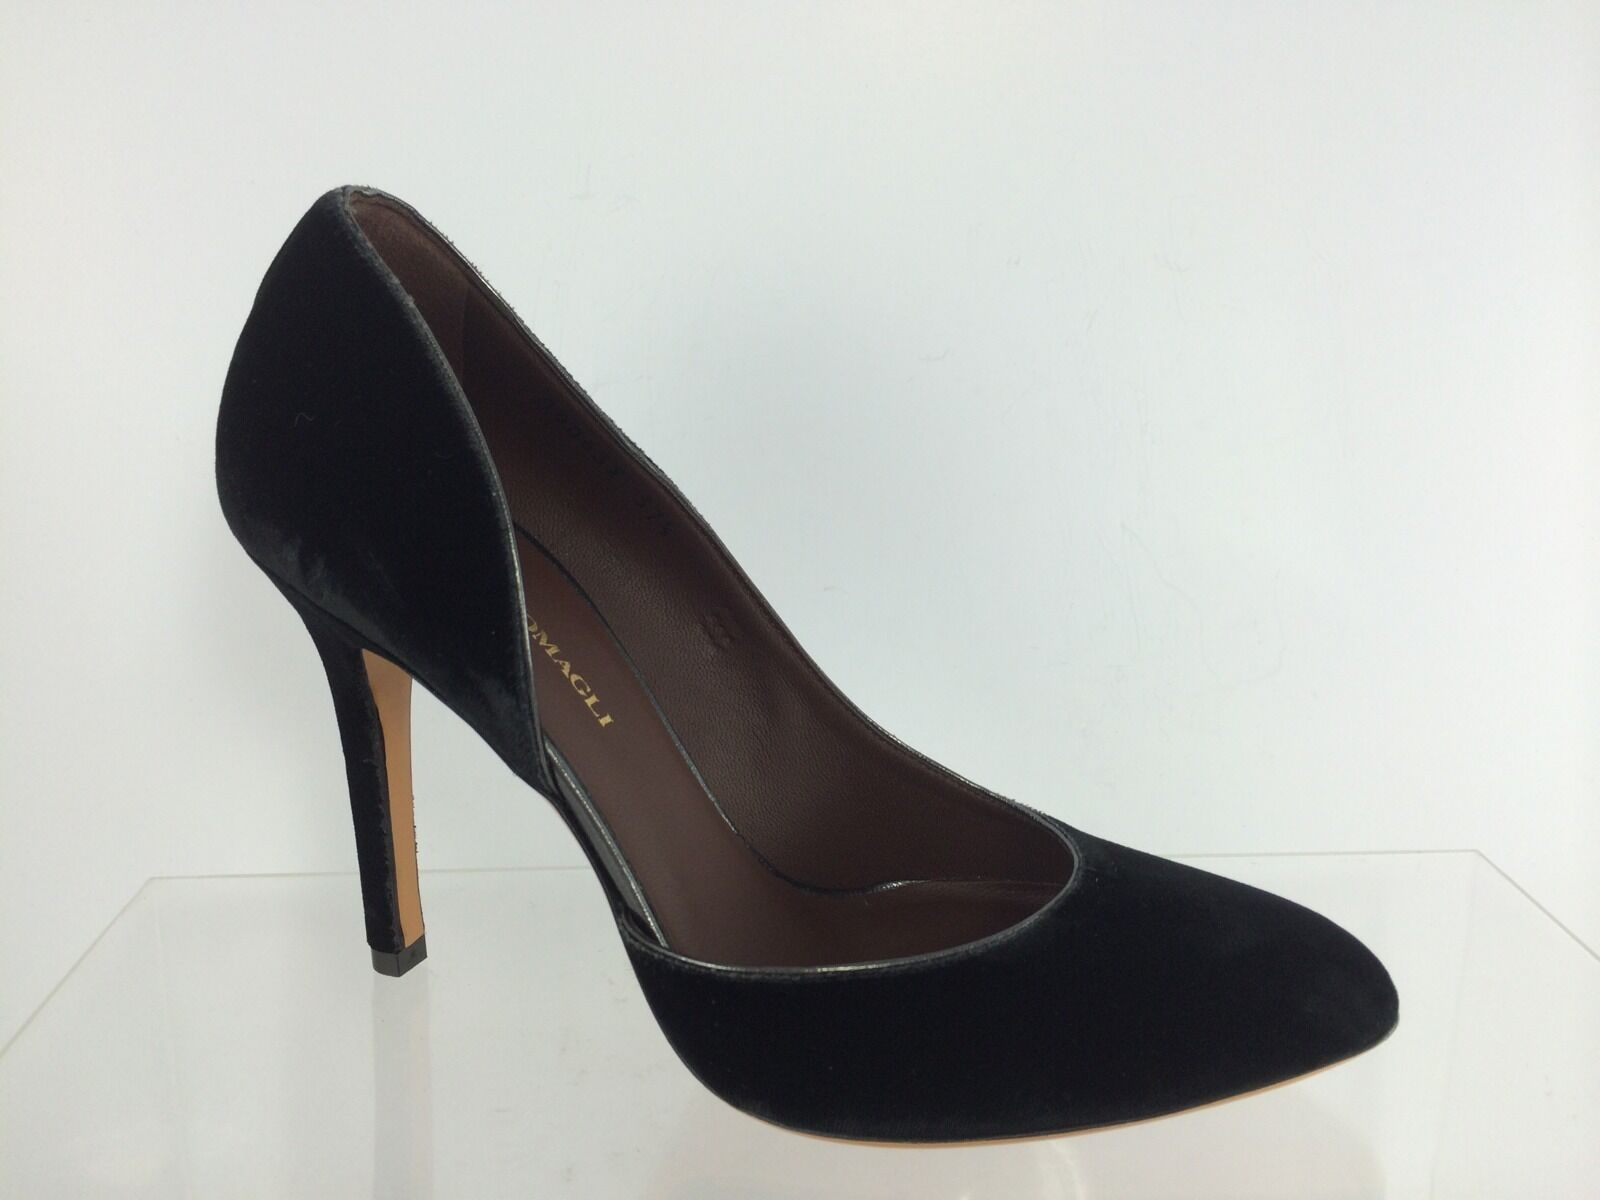 New Bruno Magli Womens Velour Black Dressy Pump Shoes 37.5